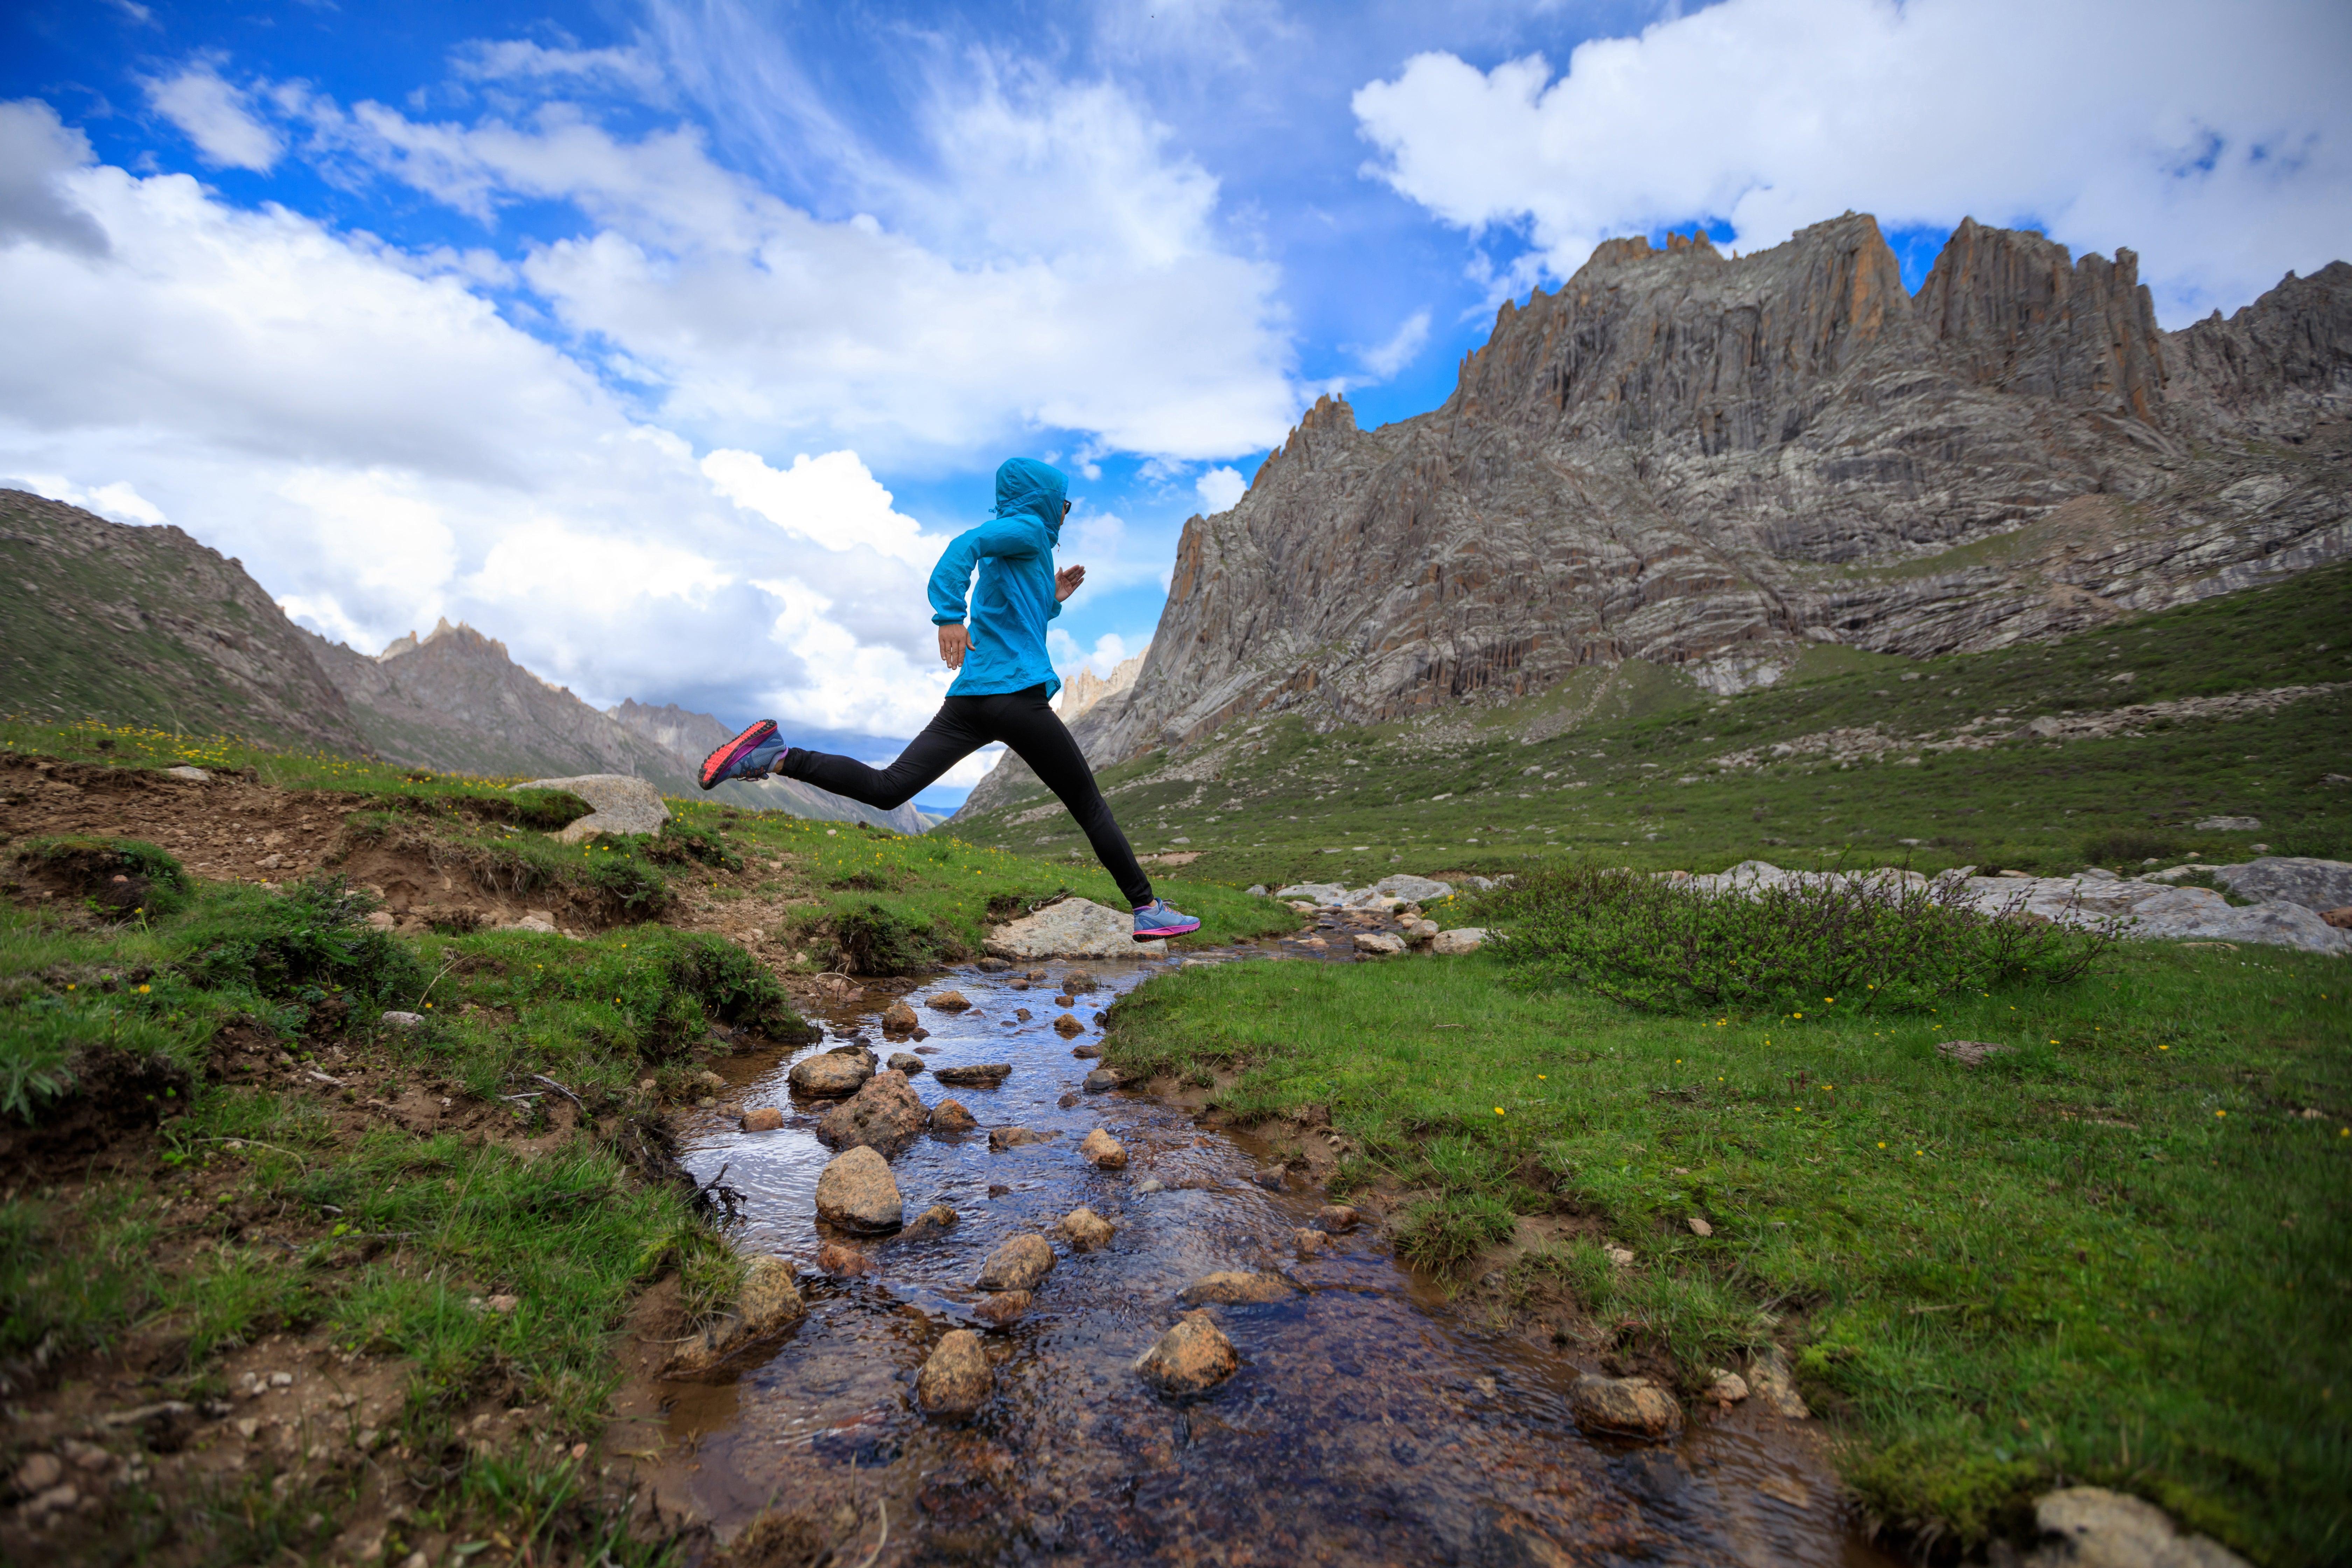 trail running mountains stream